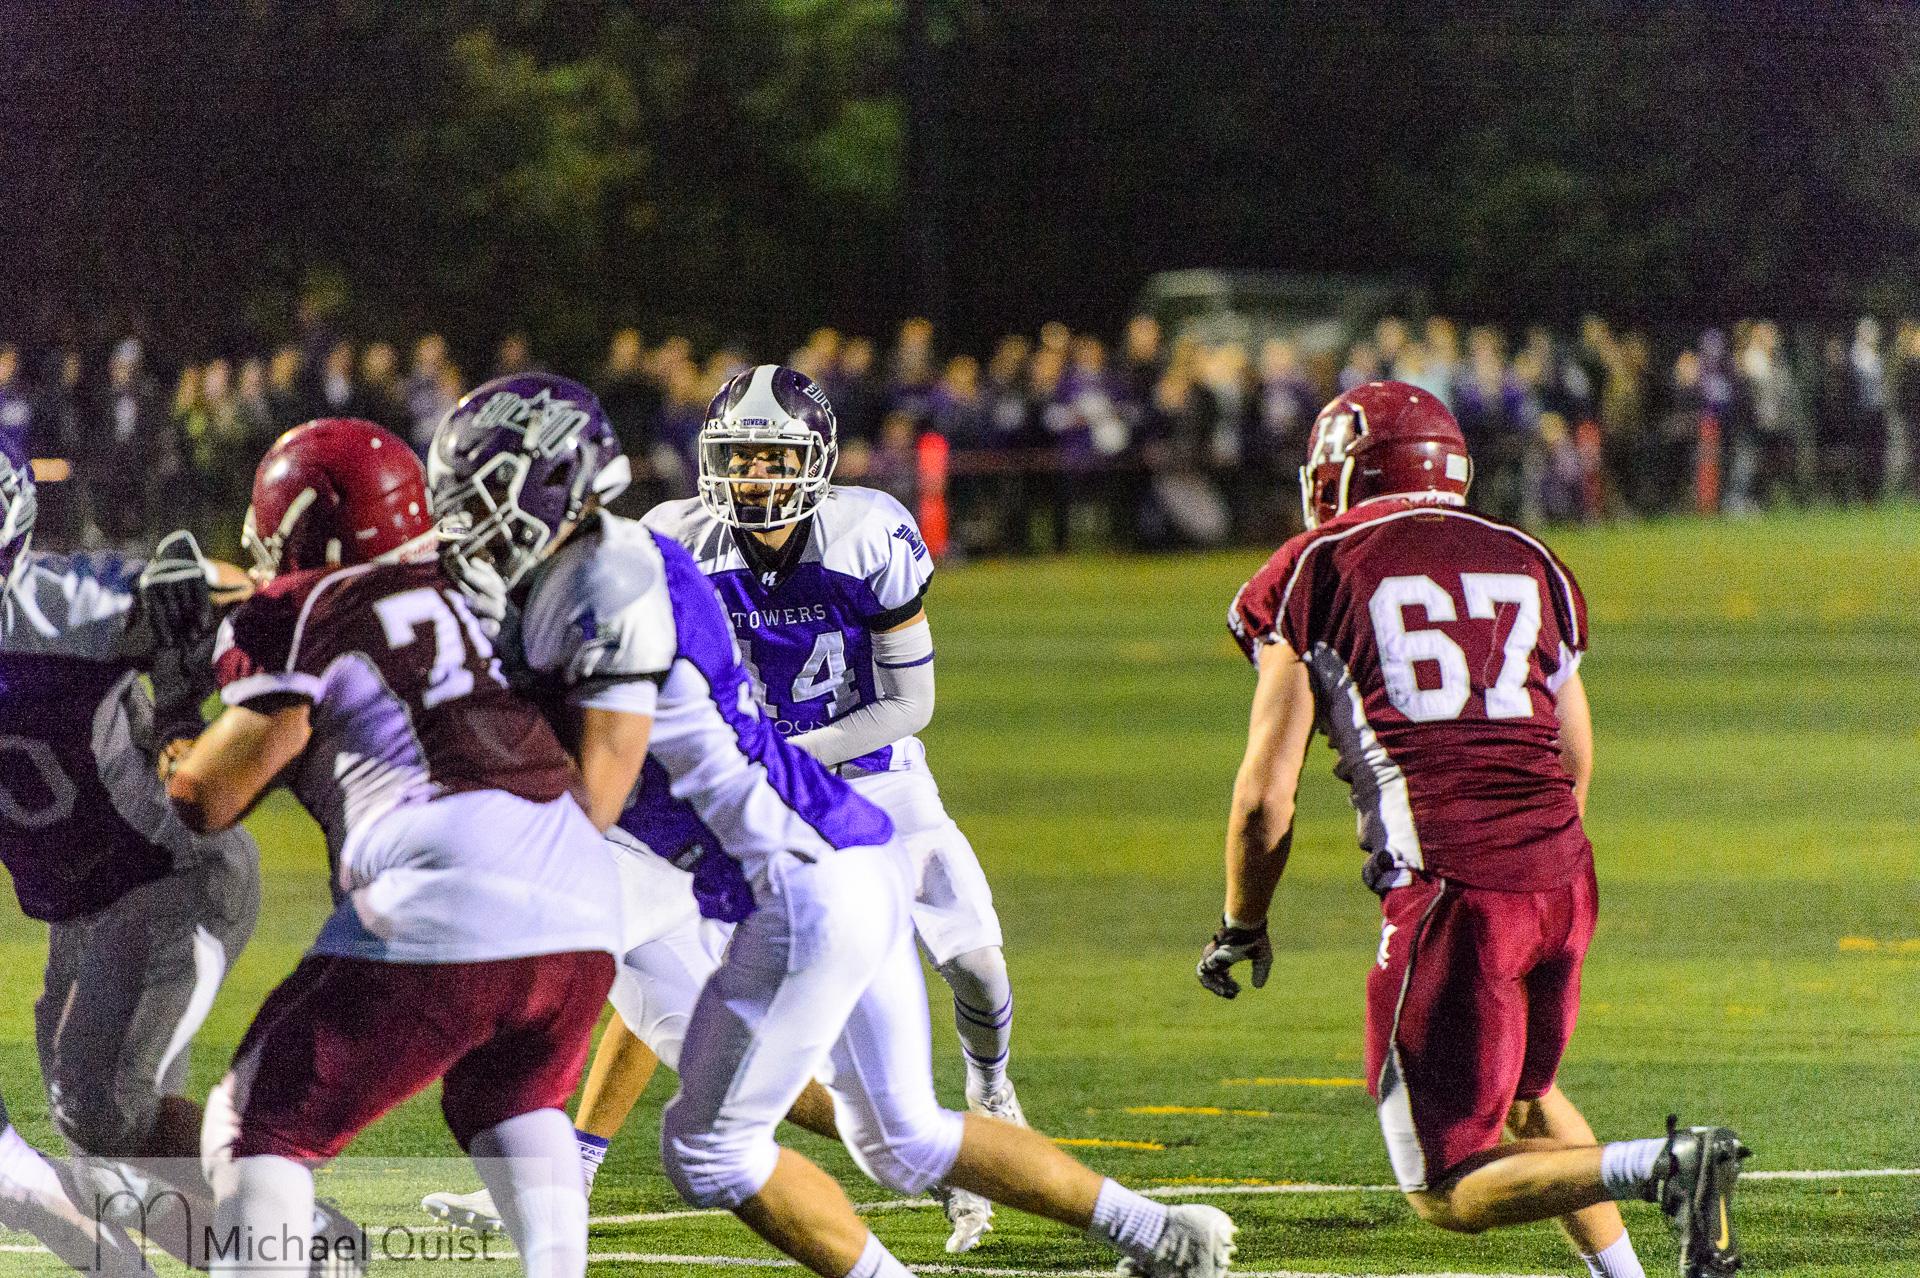 Junior-Bowl-2015-Copenhagen-Towers-vs-Herlev-Rebels-169